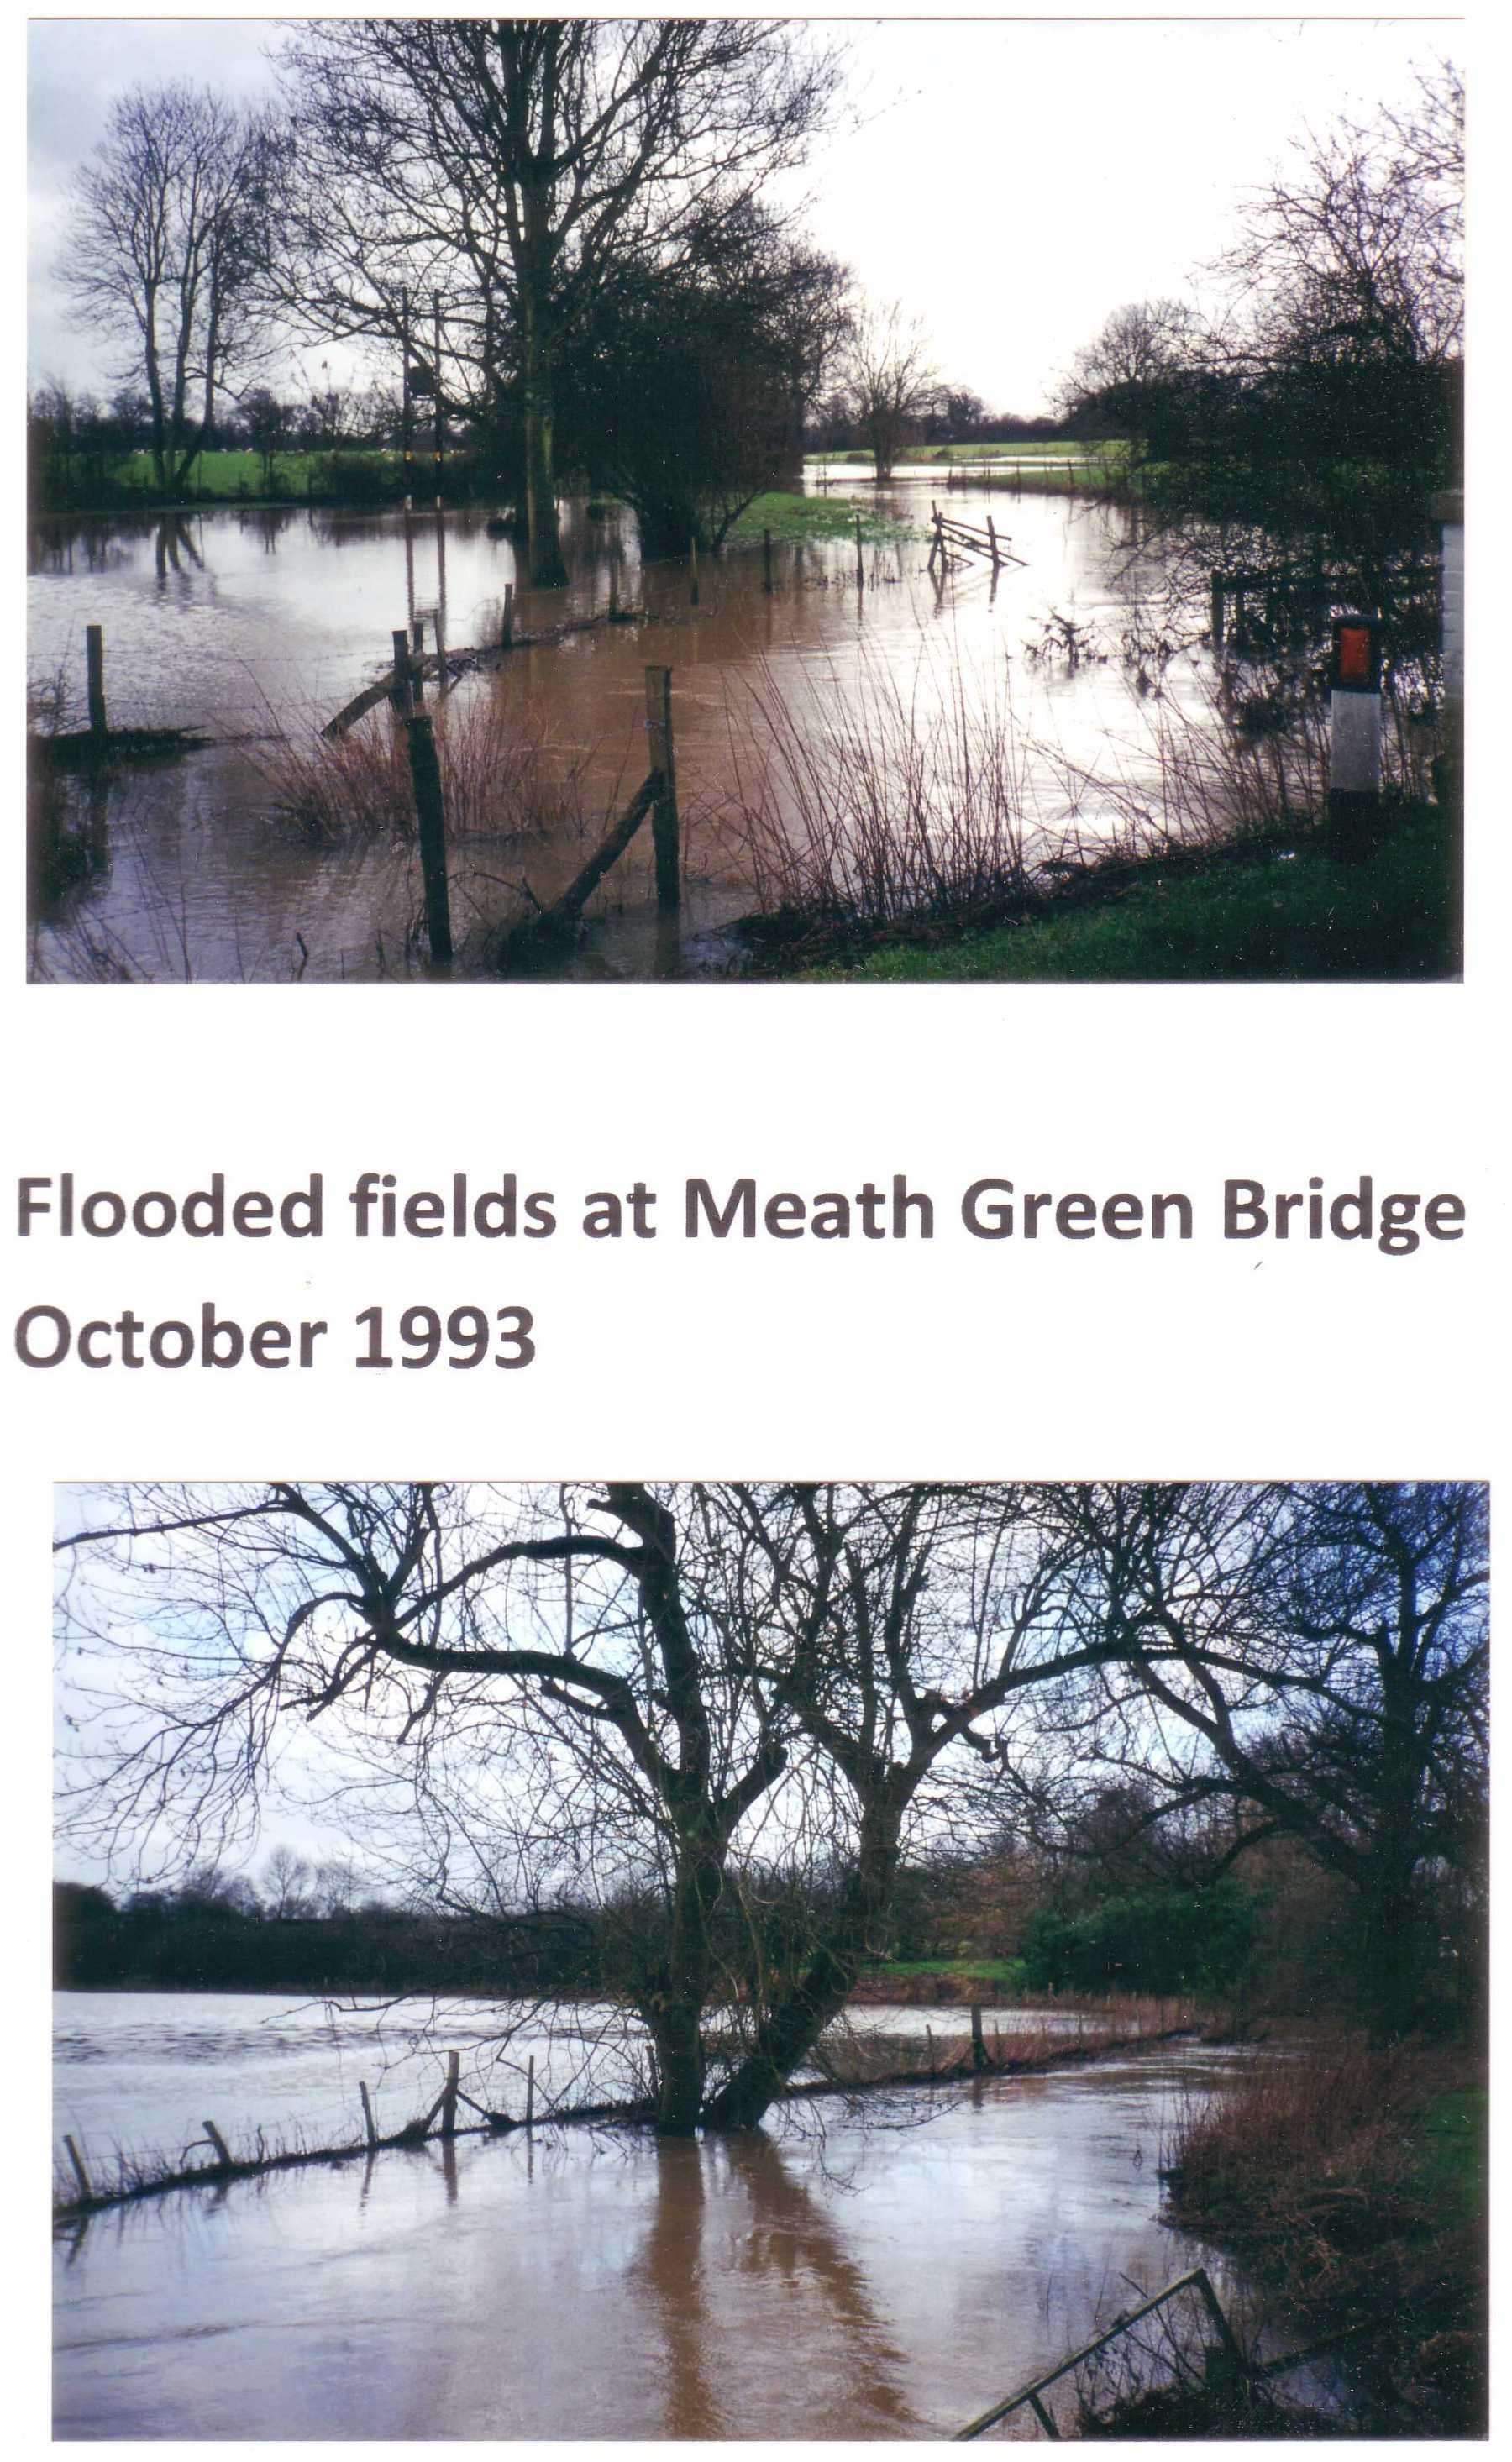 flooded fields at meath green bridge 1993